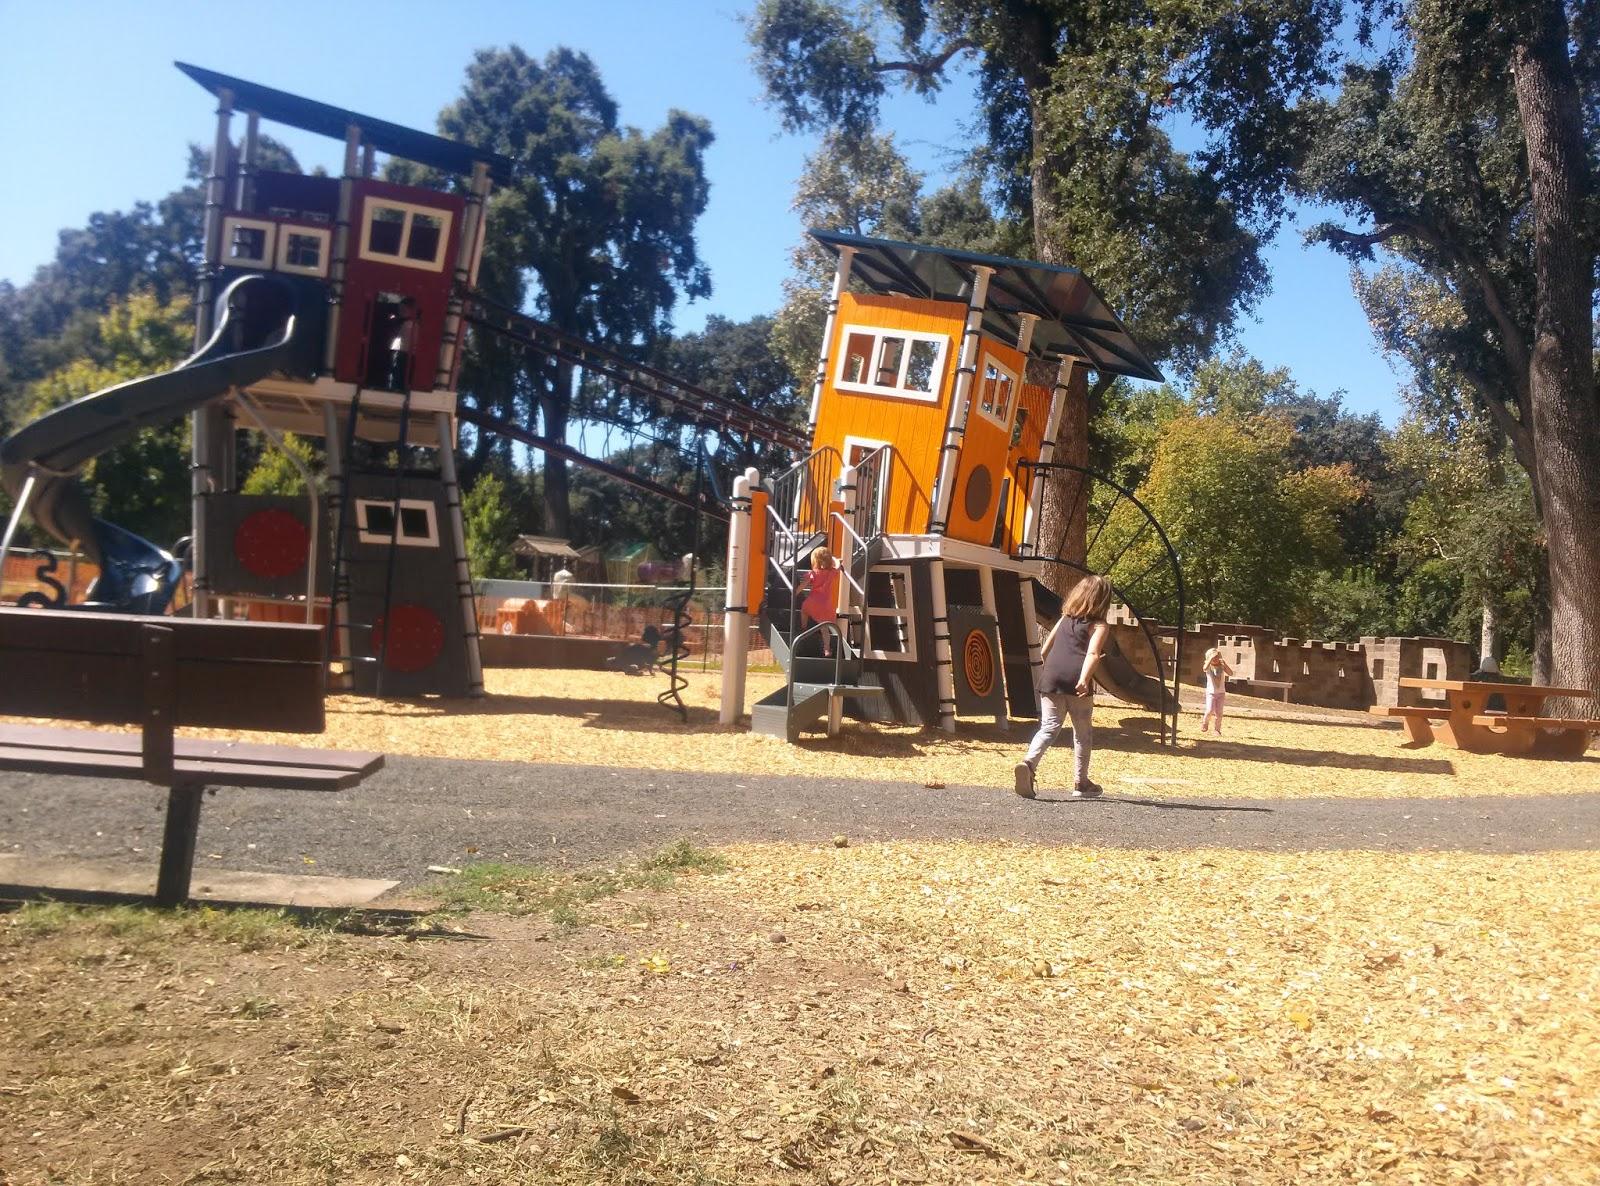 A Week In The Life Of An Eclectic Homeschooler